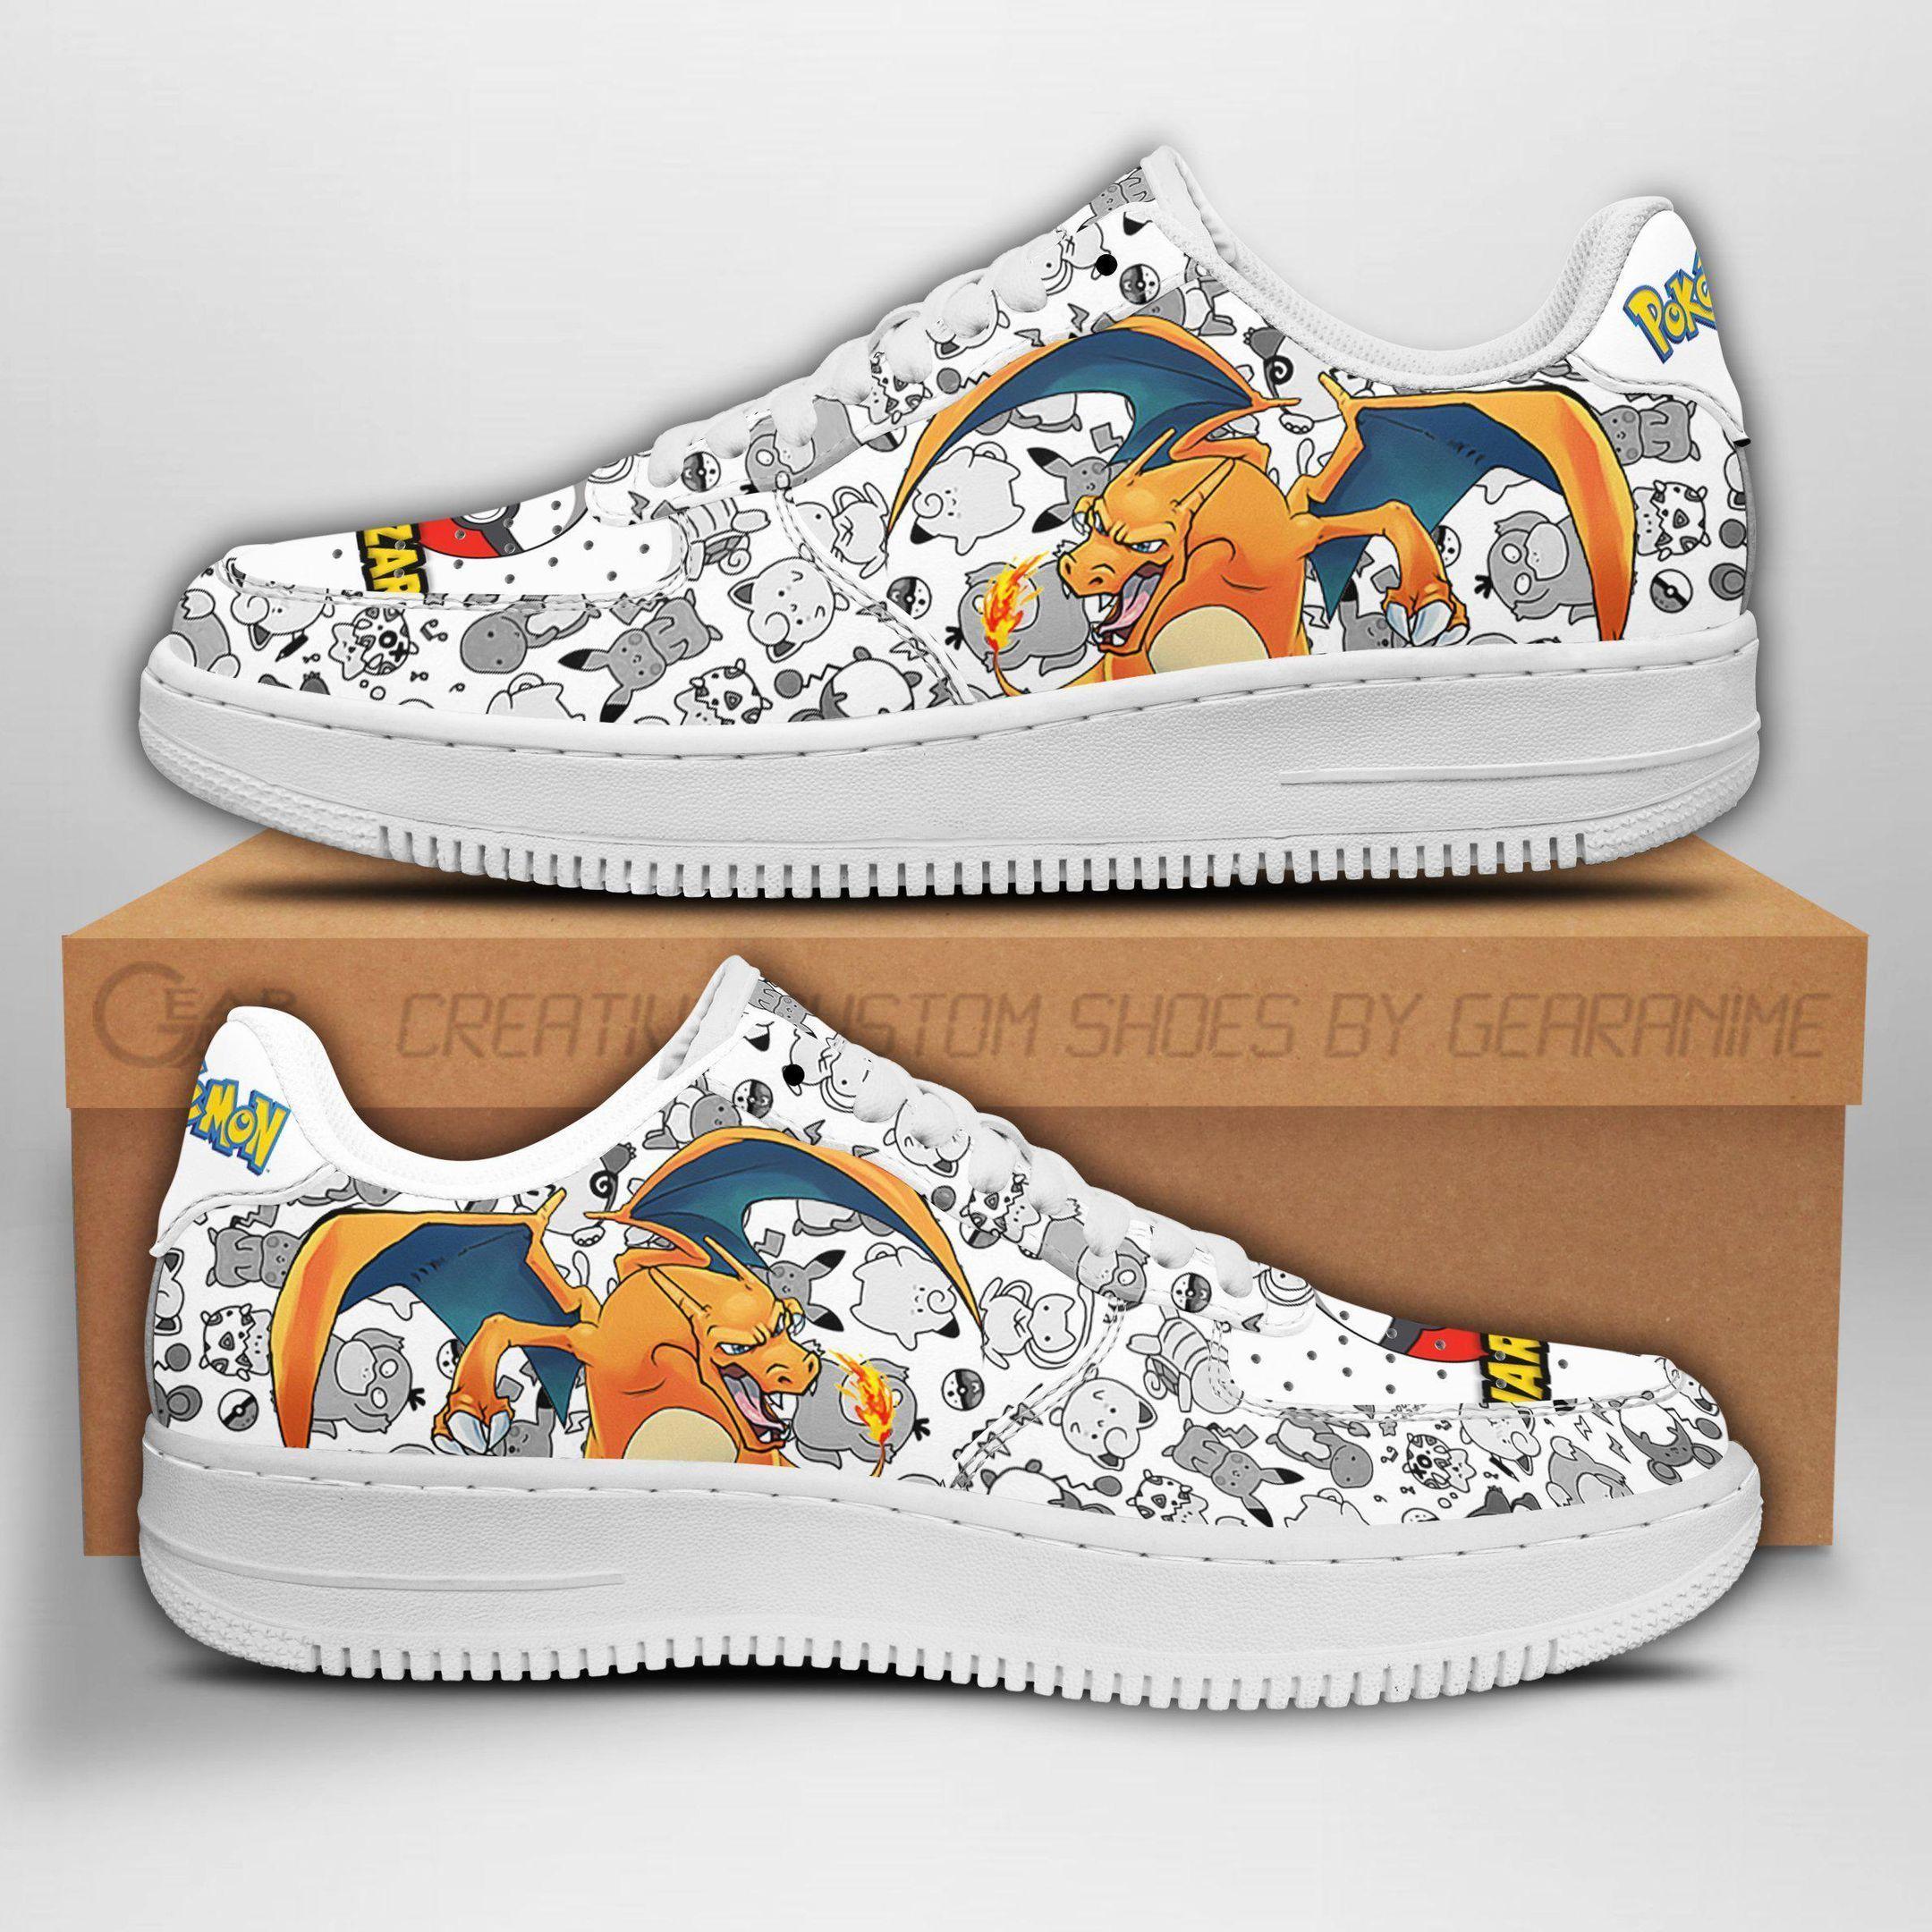 Charizard Air Shoes Pokemon Shoes Fan Gift Idea GO1012